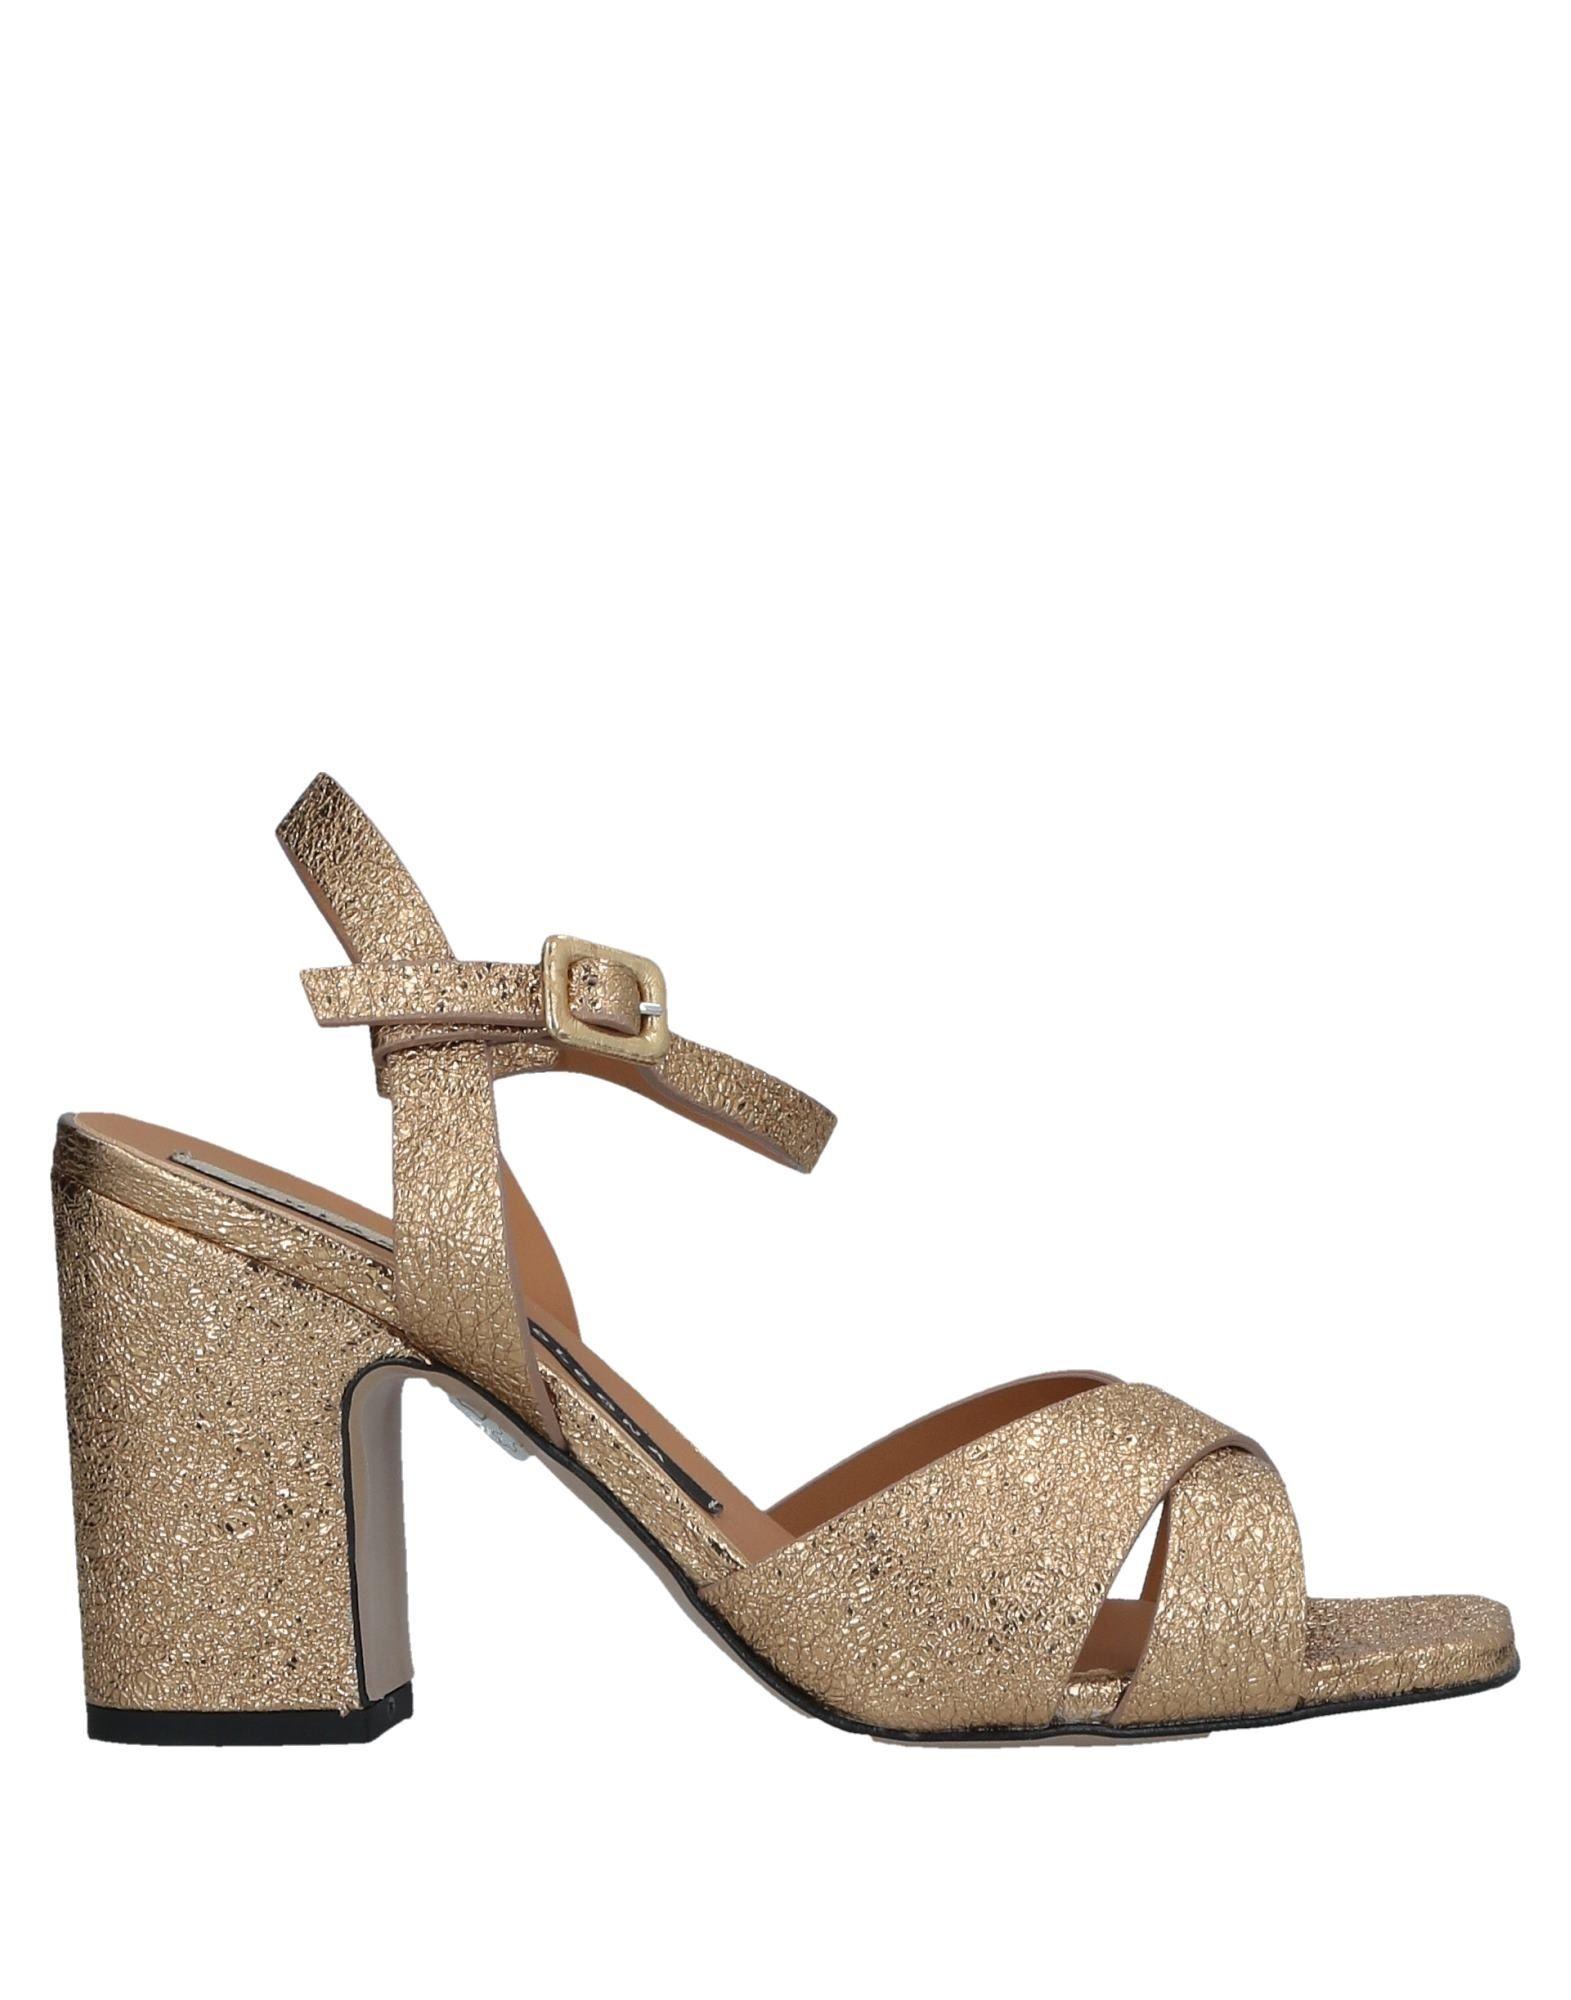 Chiarini Bologna Sandalen Damen  11528553AC Gute Qualität beliebte Schuhe